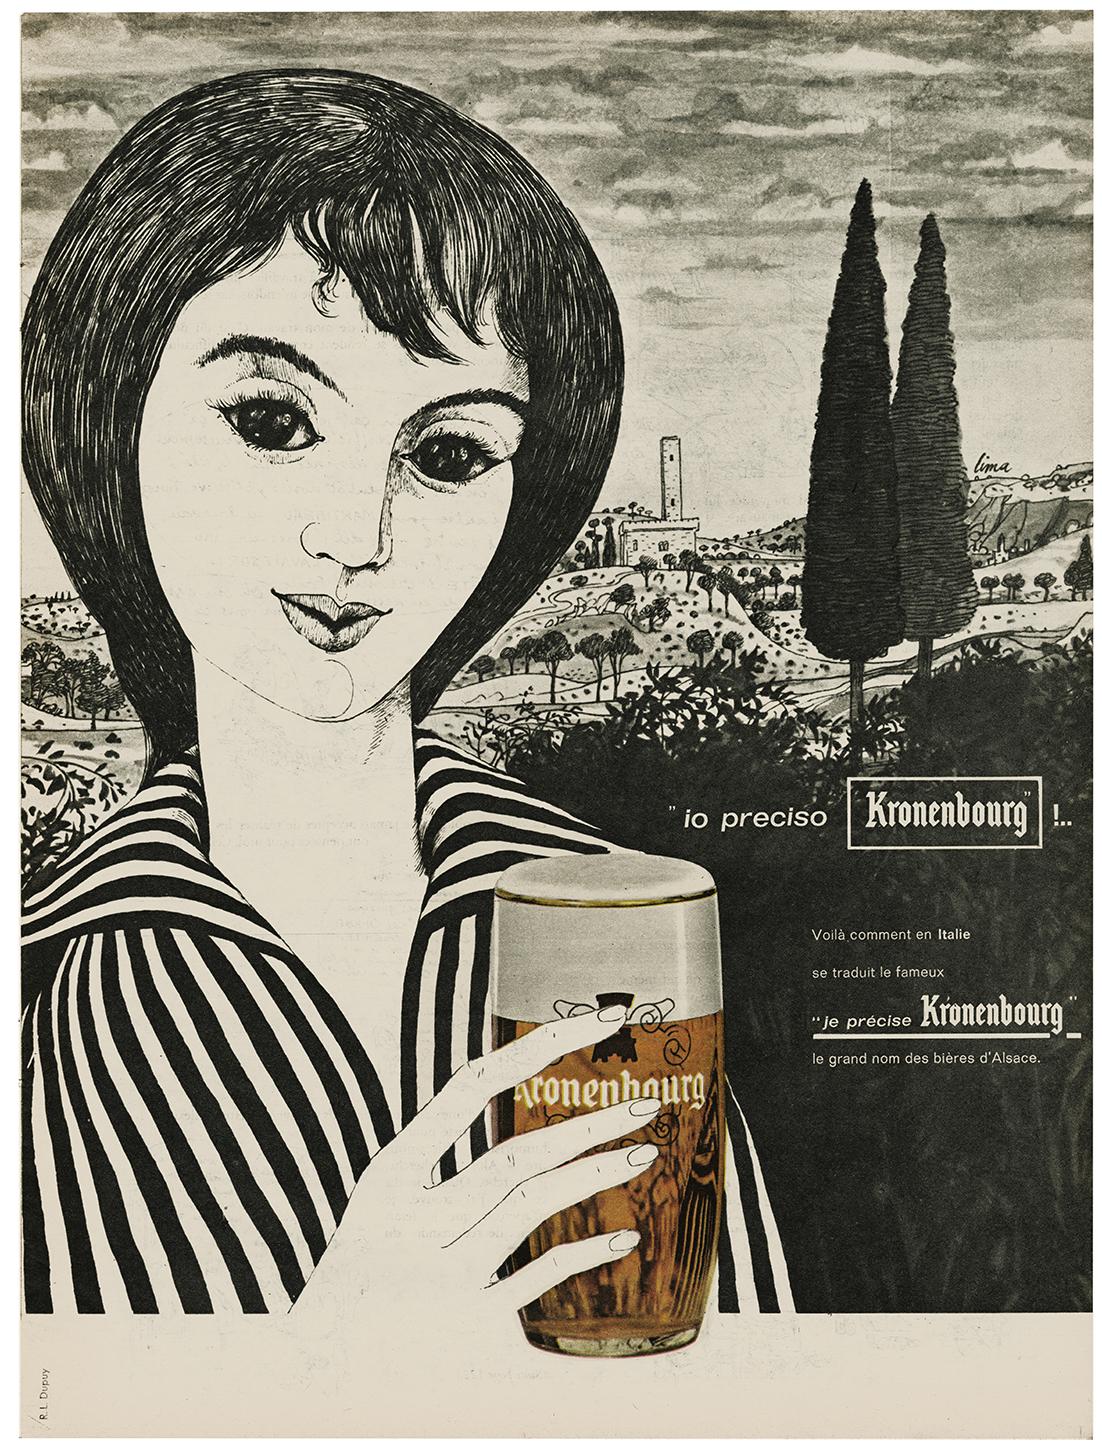 1962 kronenbourg italiana